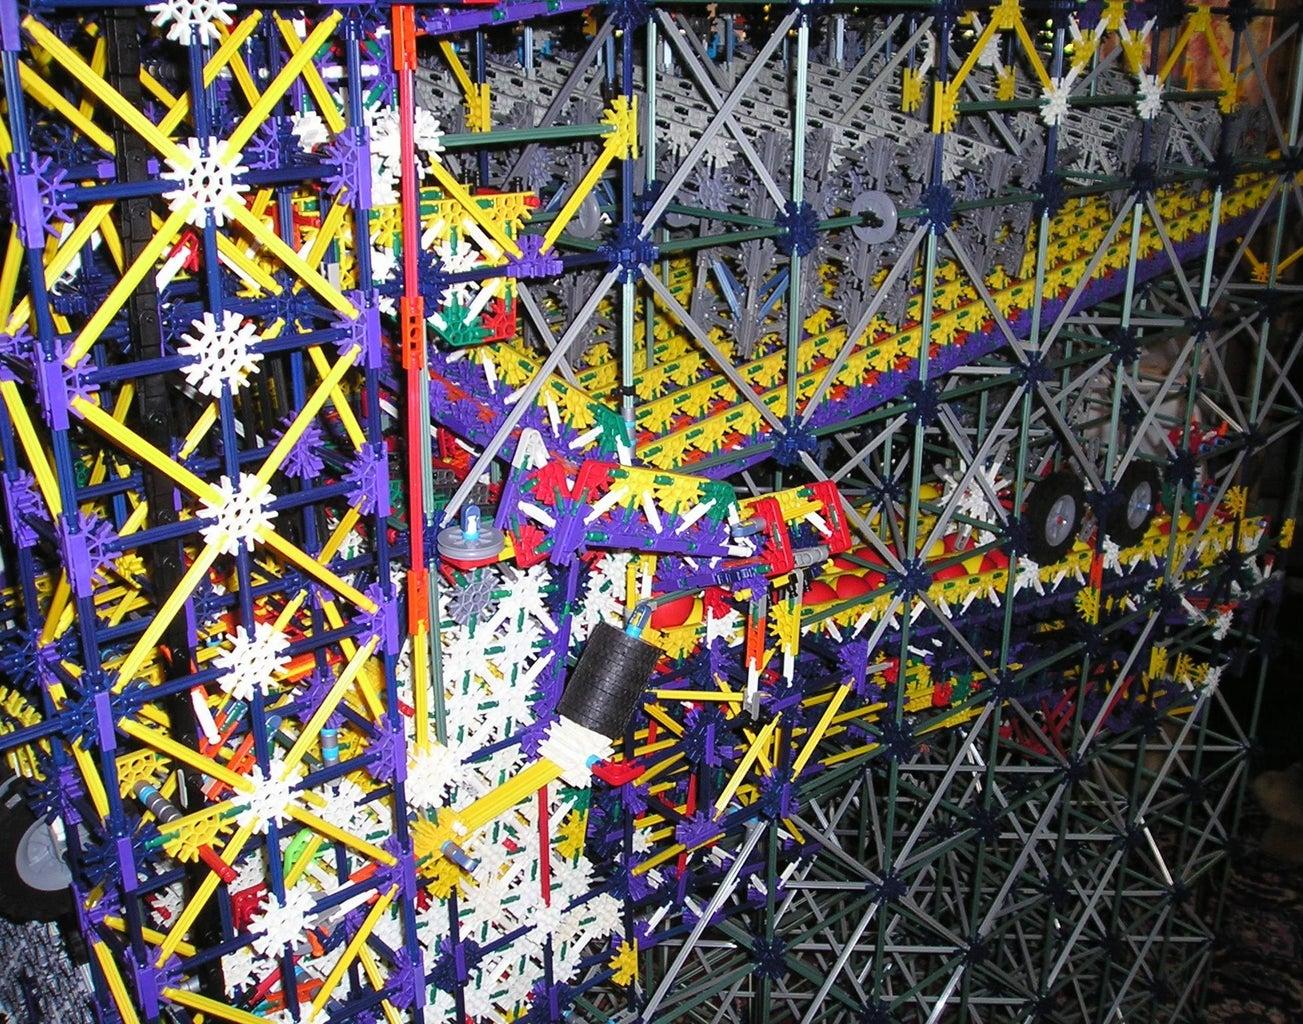 K'Nex Bouncing-Ball Amusement Machine